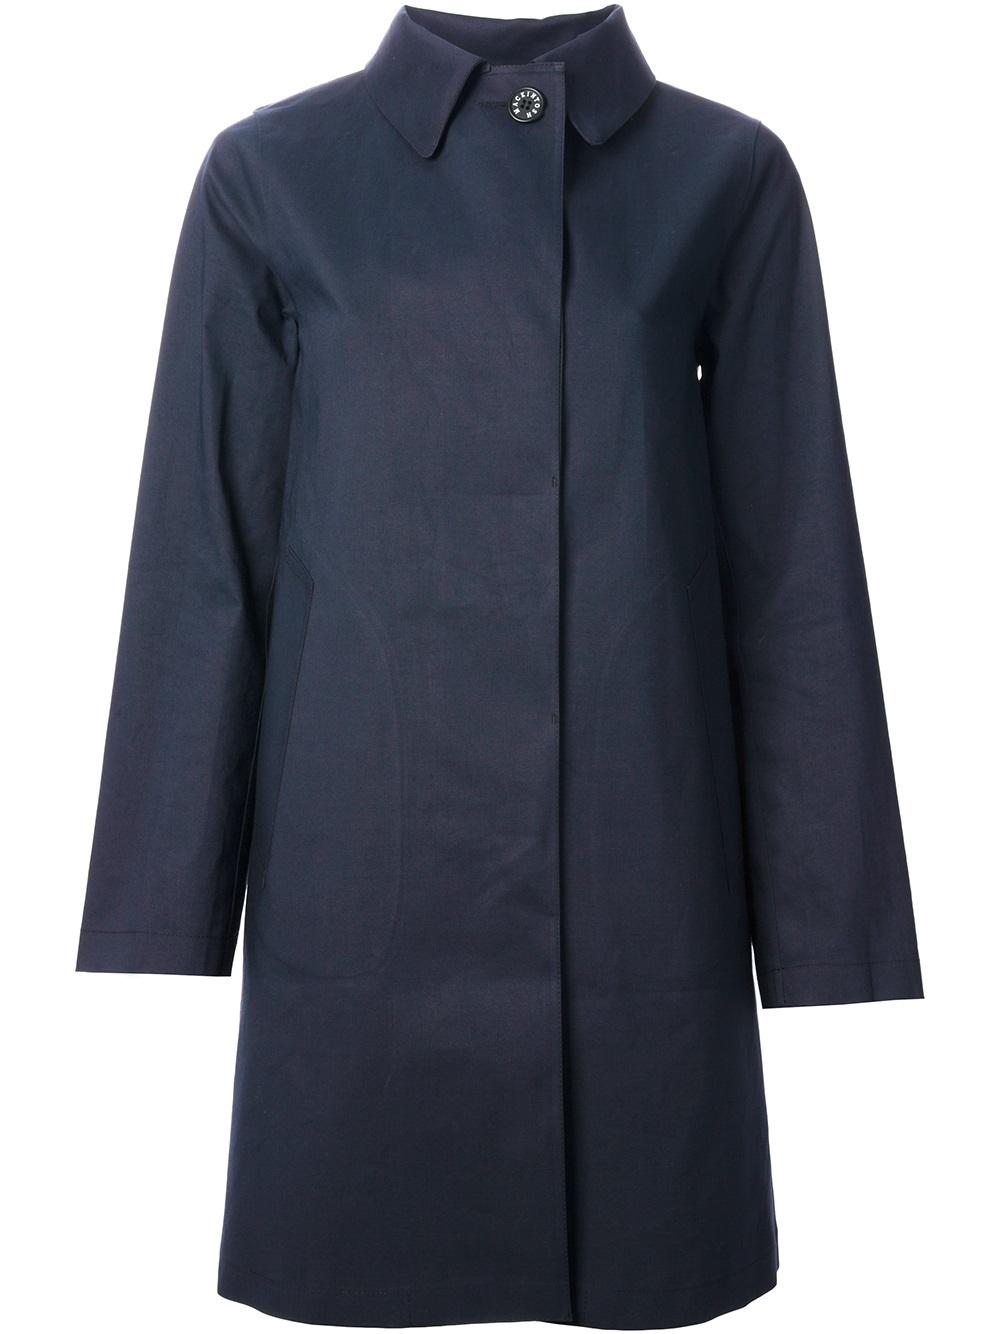 Mackintosh Banton Coat in Blue - Lyst